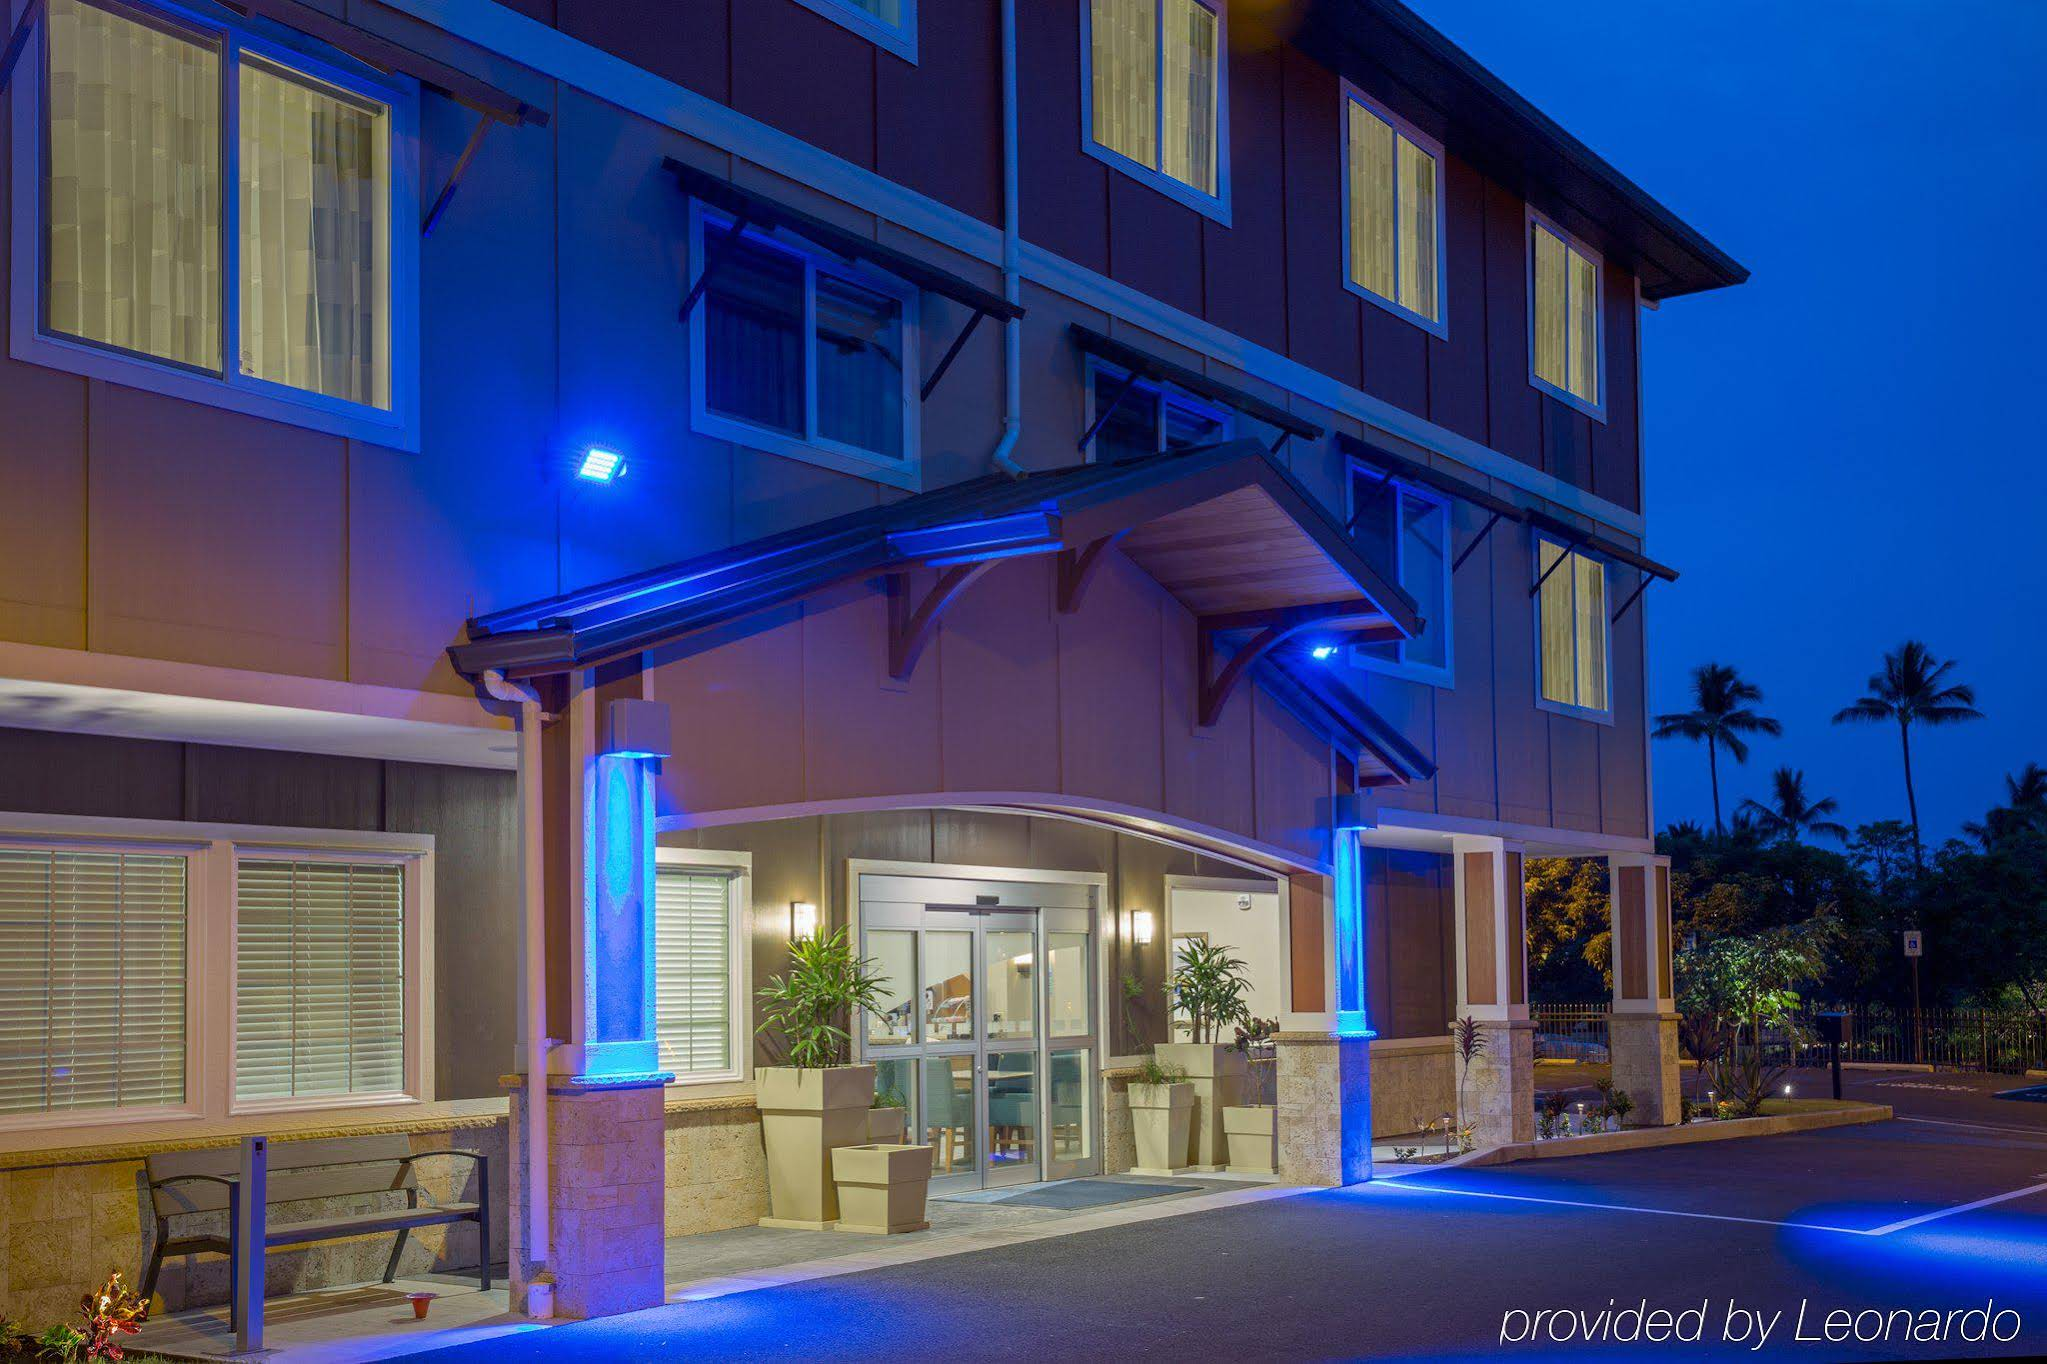 Holiday Inn Express & Suites Kailua Kona